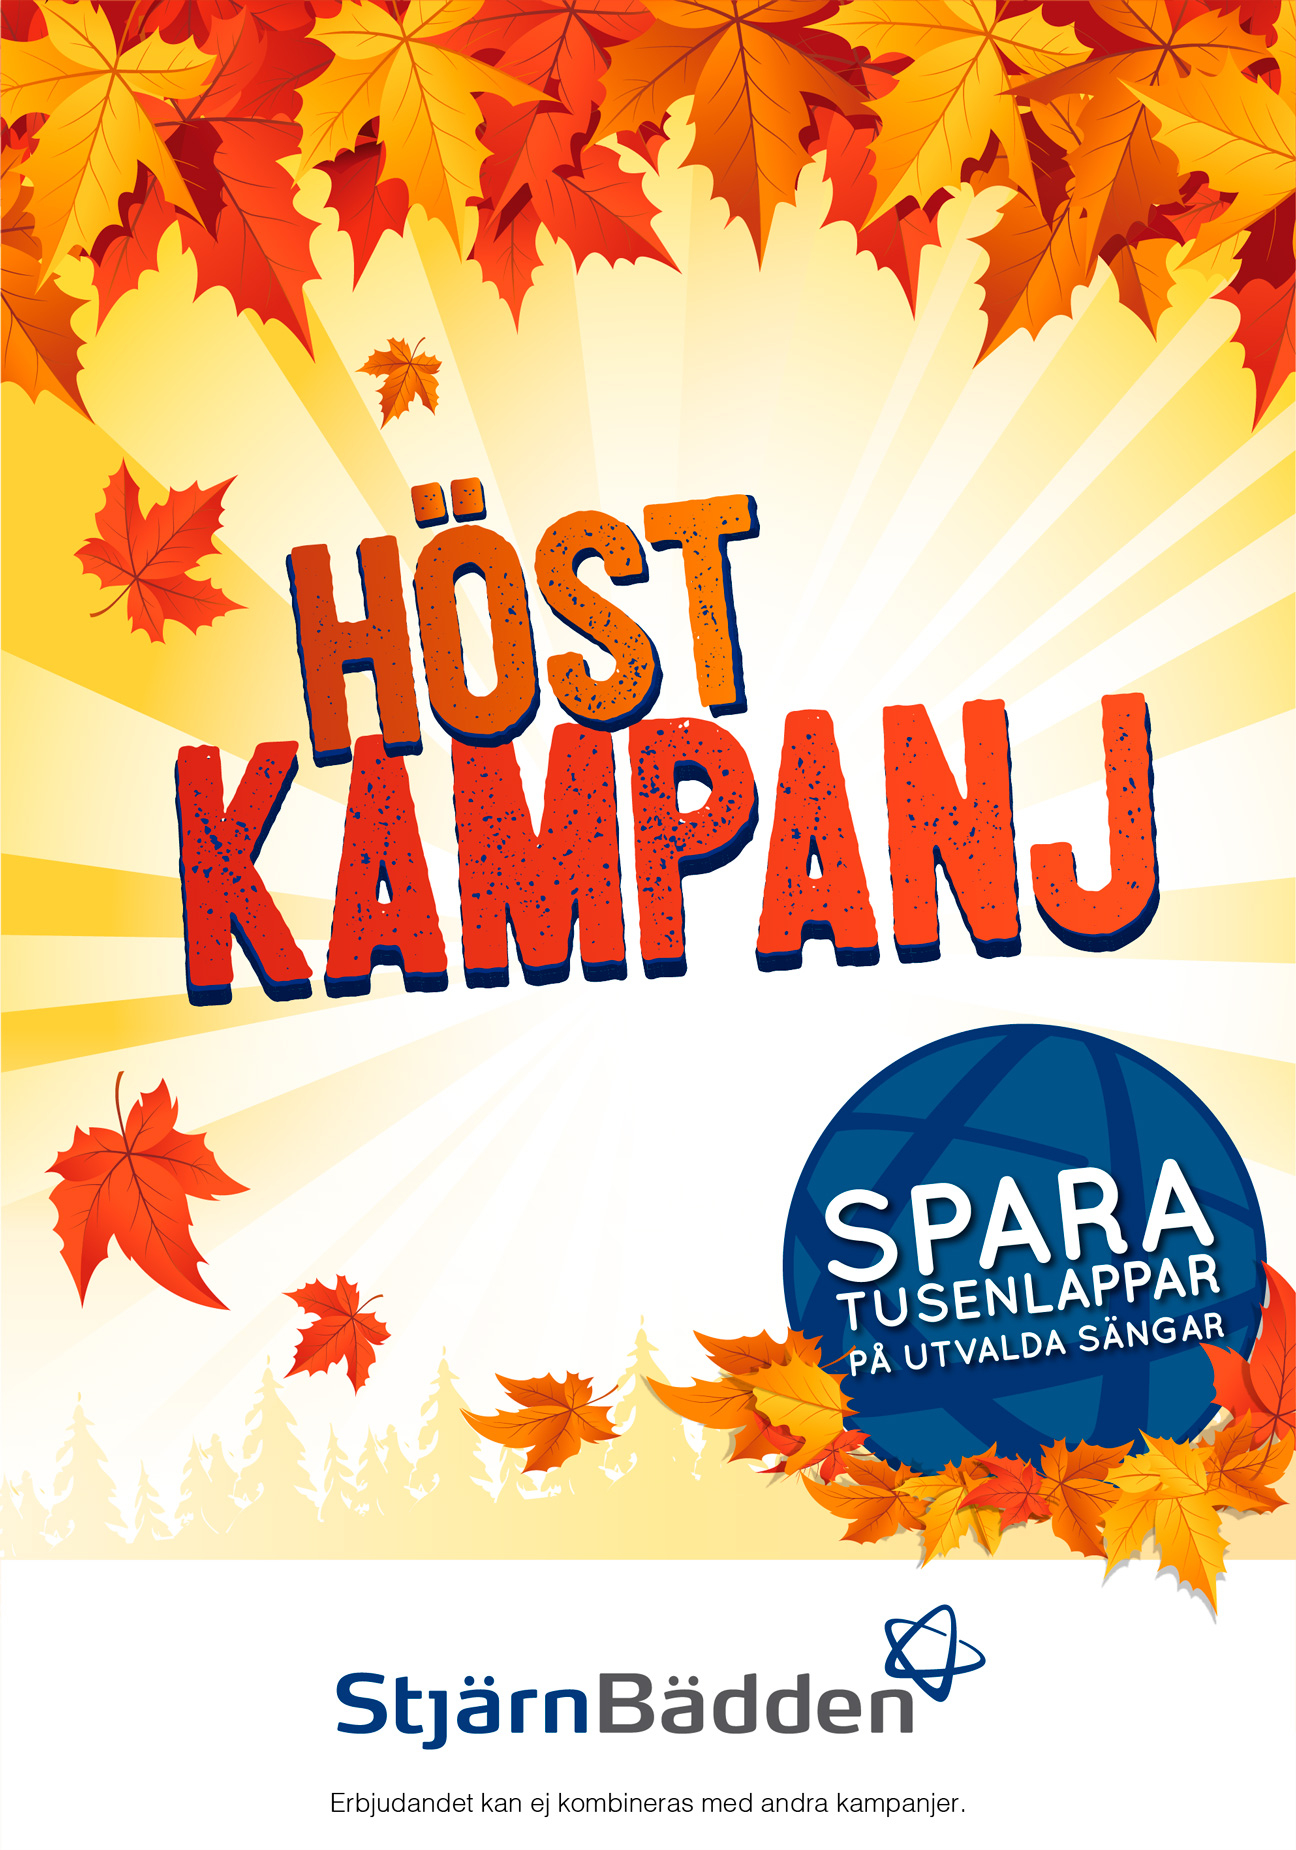 Stjärnbädden design campaign from autumn 2011